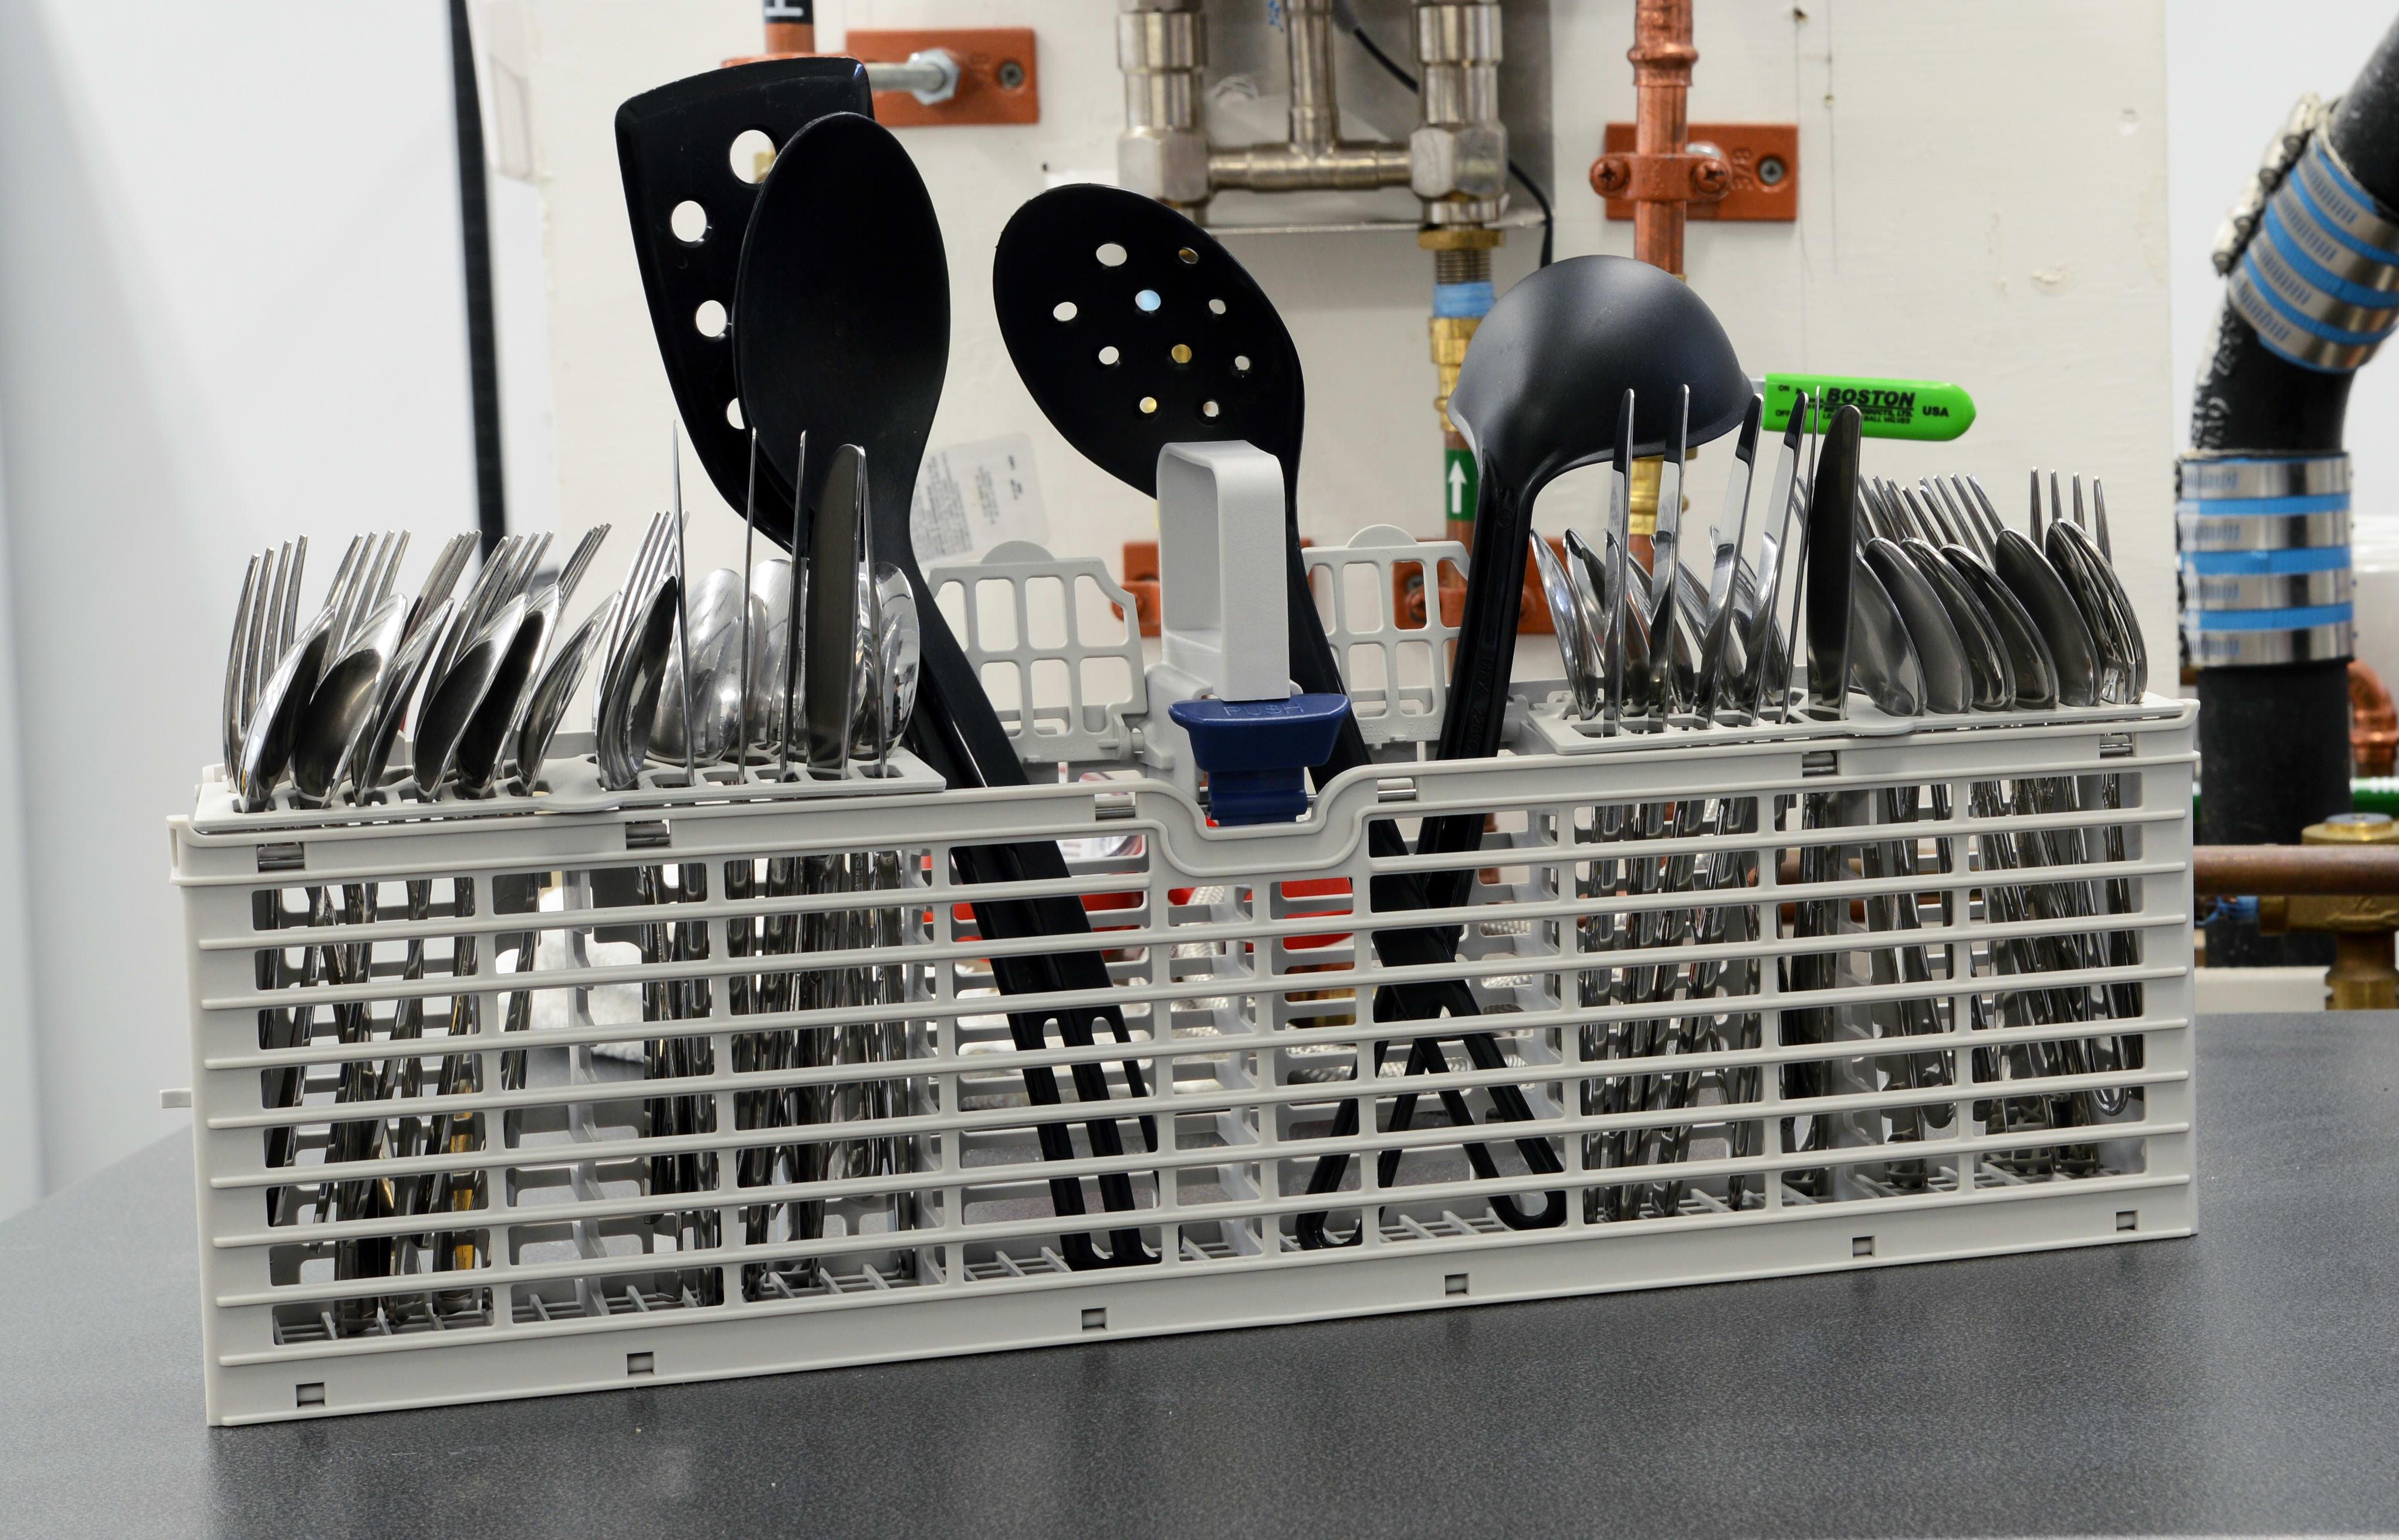 Whirlpool WDF540PADM loaded cutlery basket